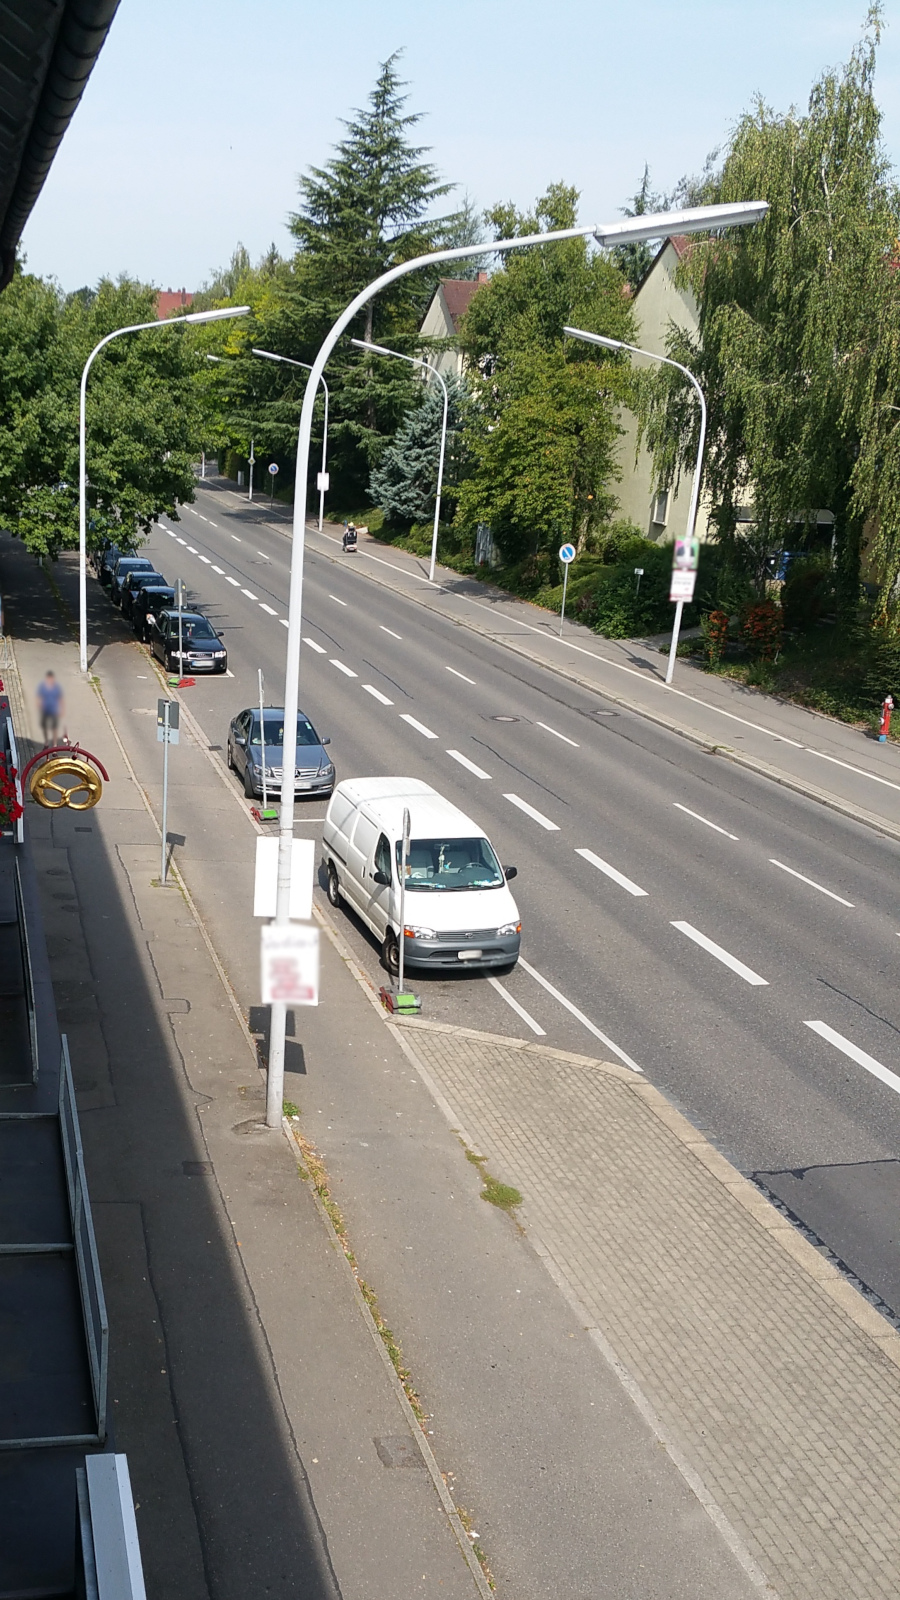 Parken am 1.9. tagsüber eingeschränkt wegen Baustelle vorm miradlo Versanddepot Konstanz - Kurzparkplatz, Parkreihe vorm Laden